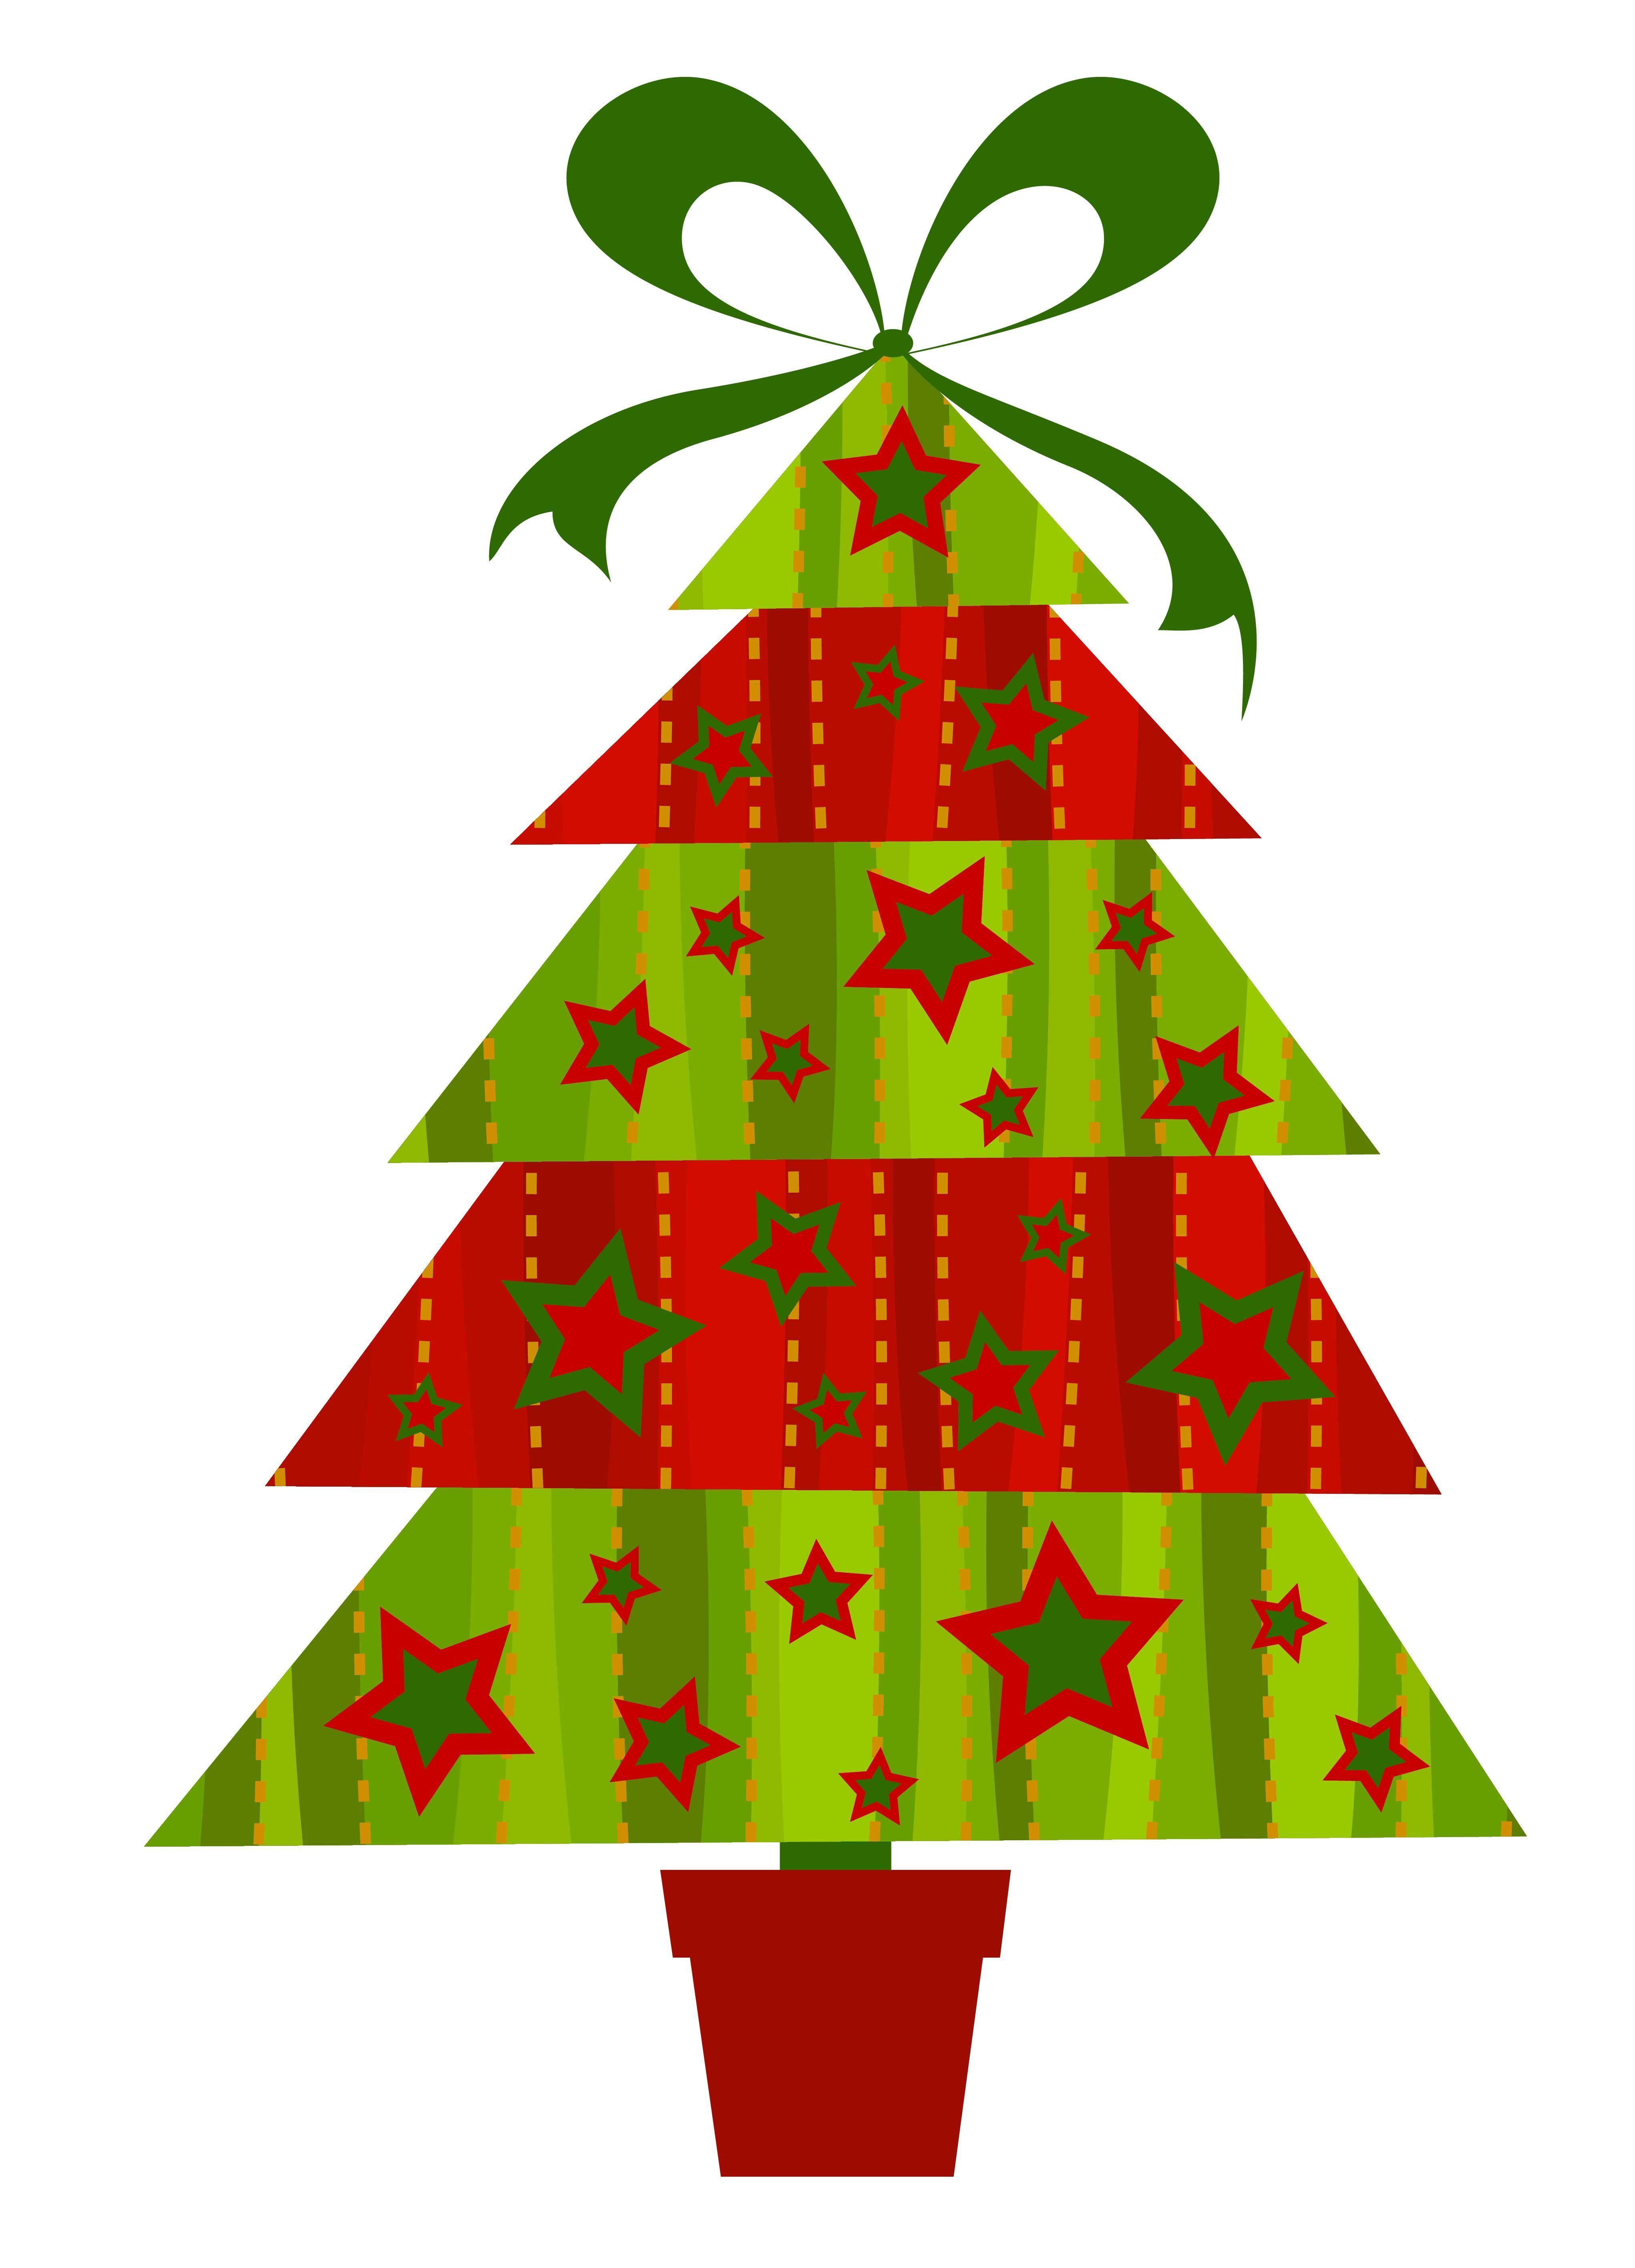 20 Amazing Free Christmas Tree Images Christmas Tree Images Christmas Tree Clipart Modern Christmas Tree